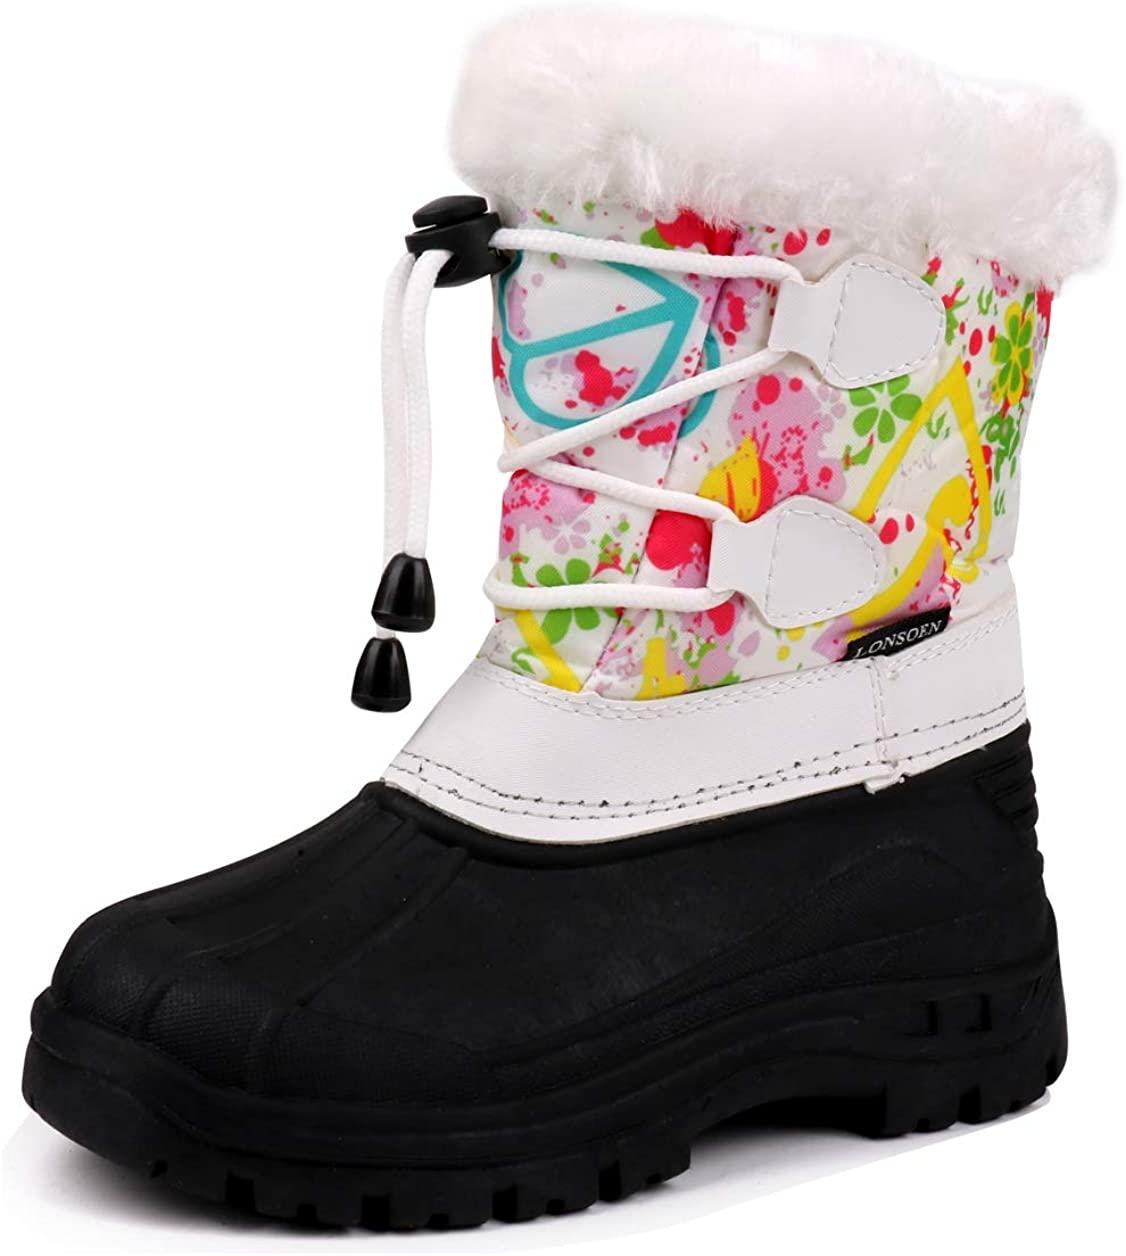 LONSOEN Kid's Boys Girls Frosty Winter Snow Boots Fur Lined Warm Anti-Slip Mid Calf Boots